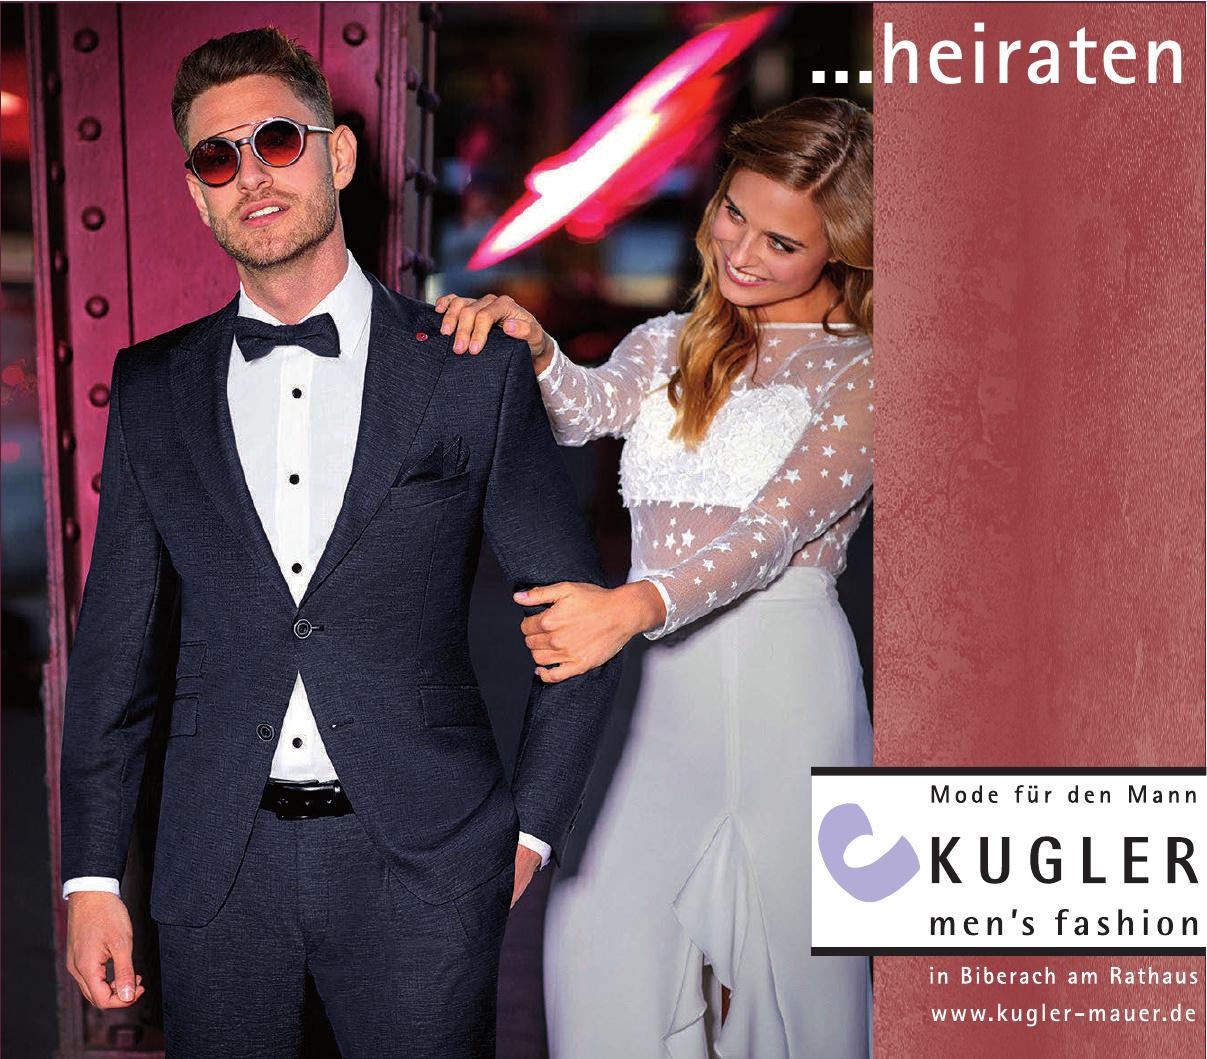 Kugler Men´s Fashion